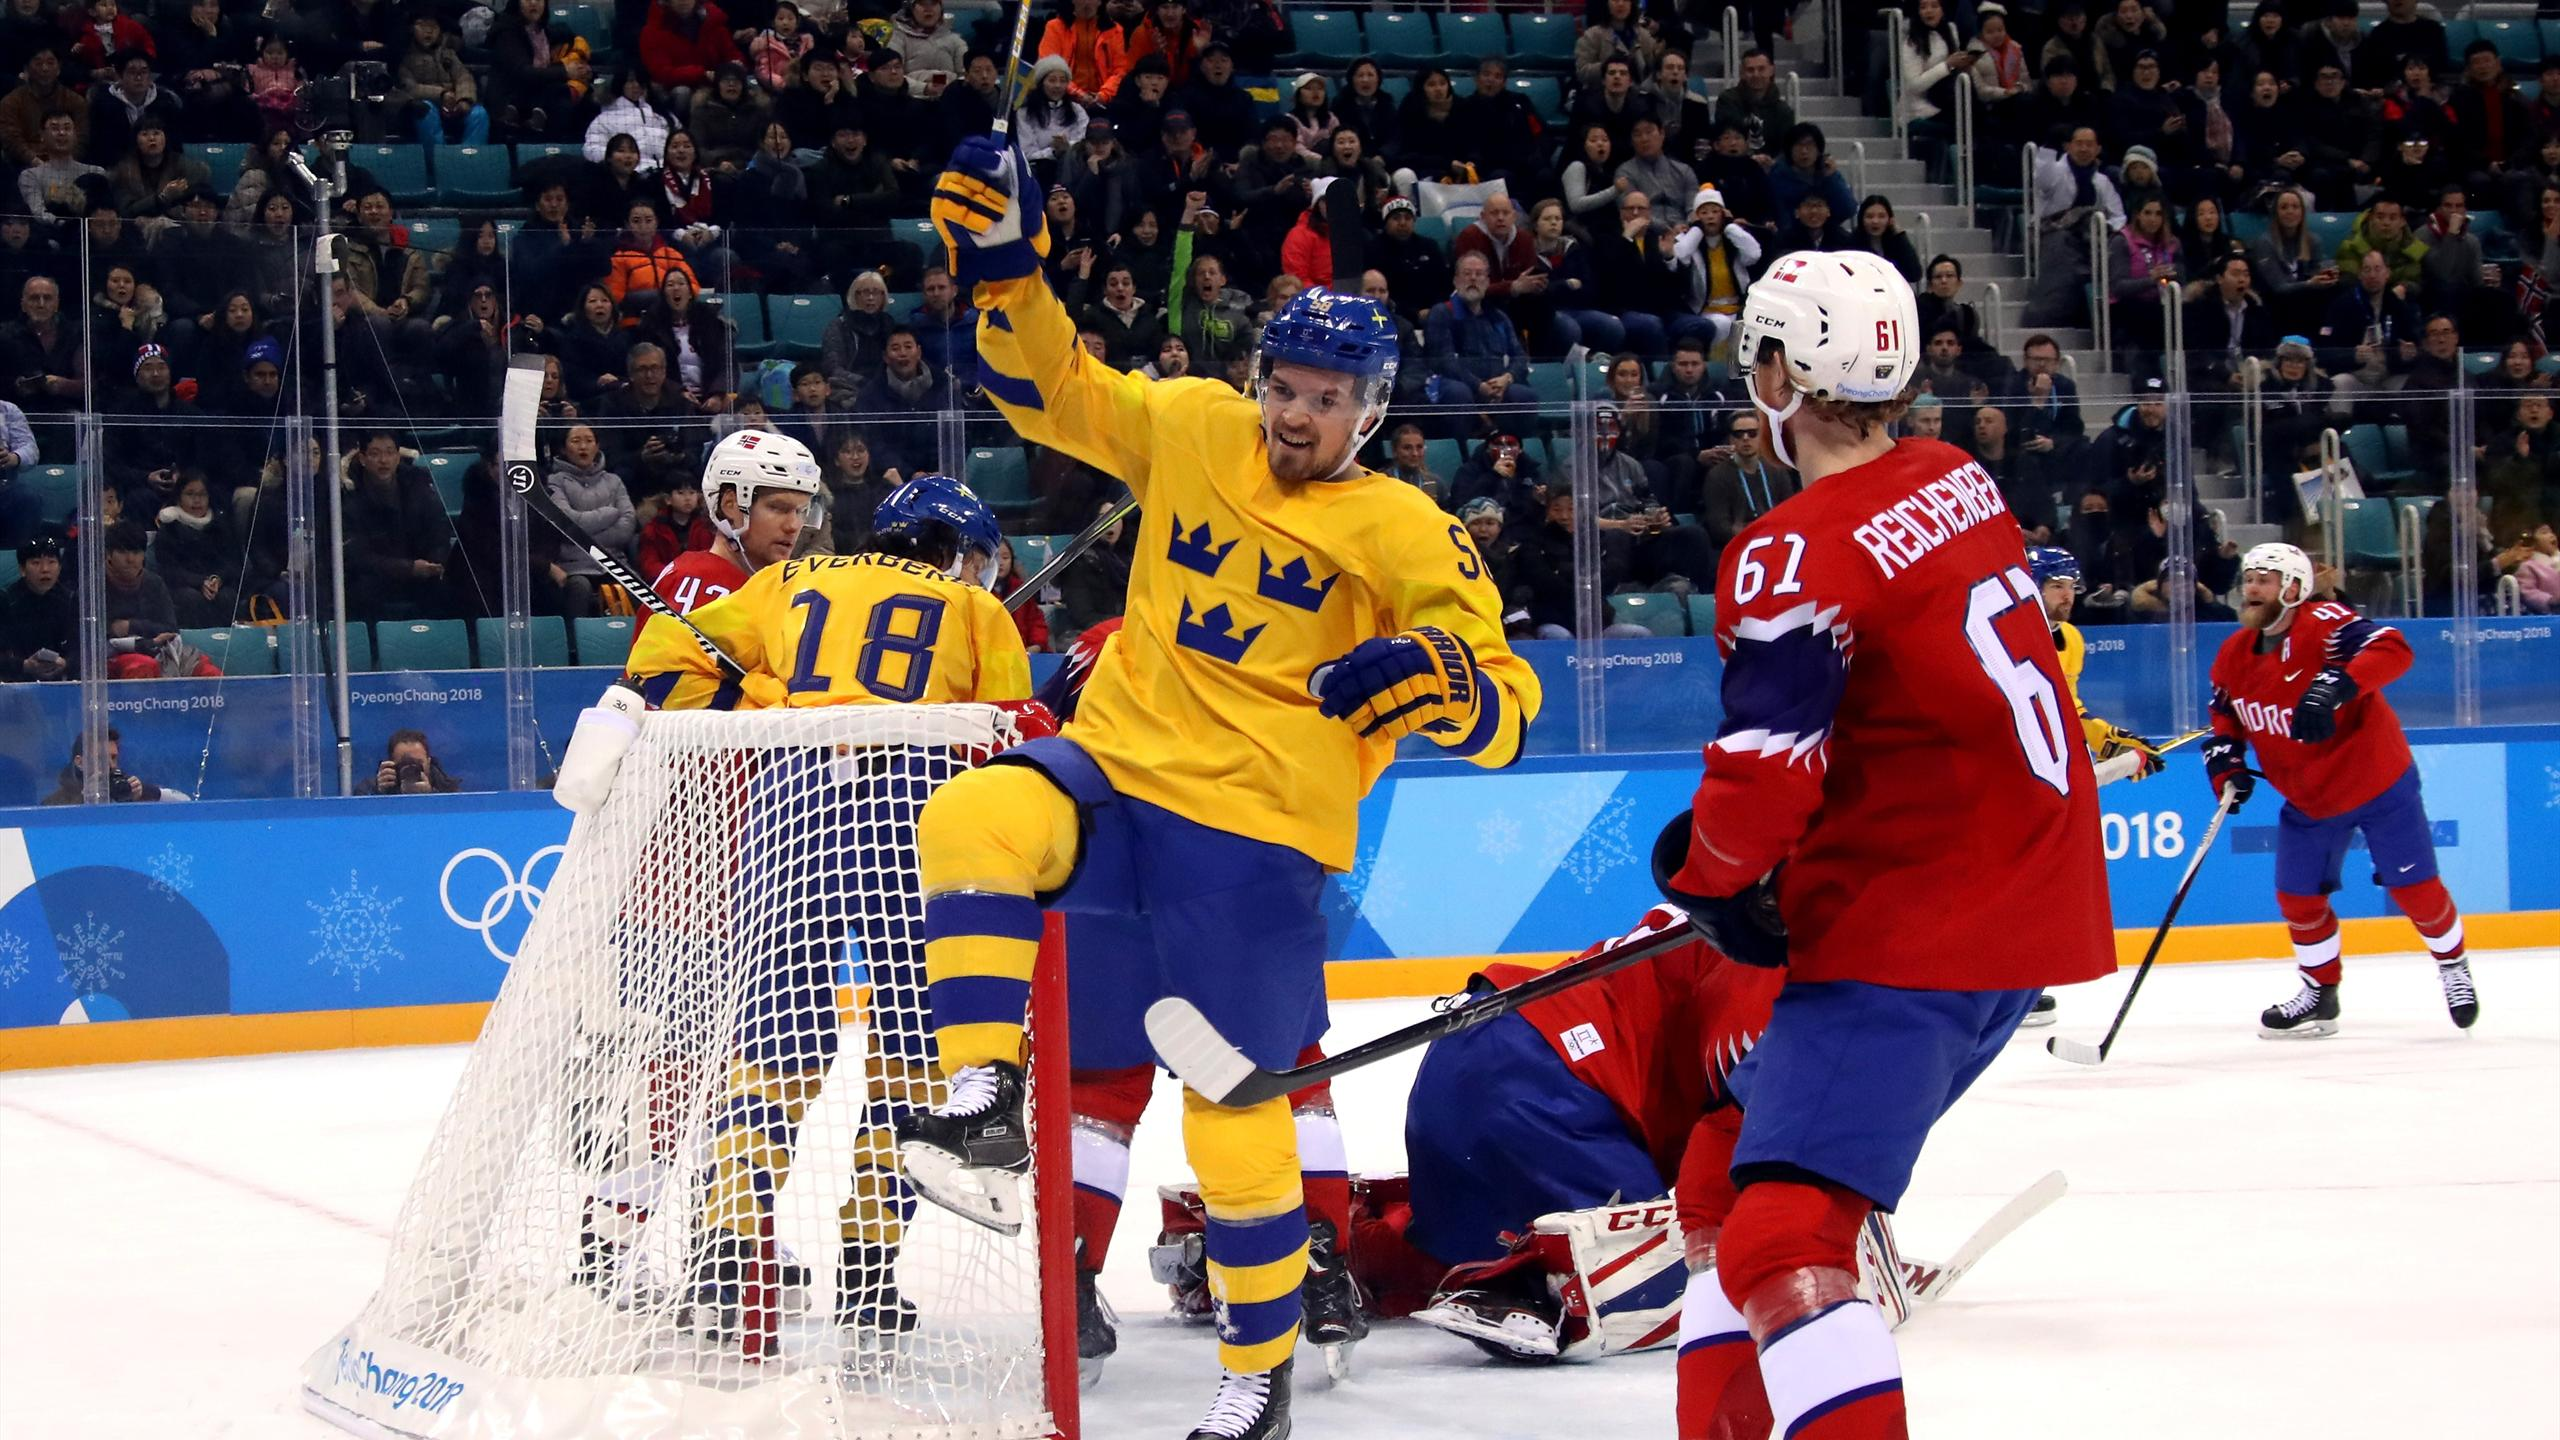 Olympia Eishockey Ergebnisse